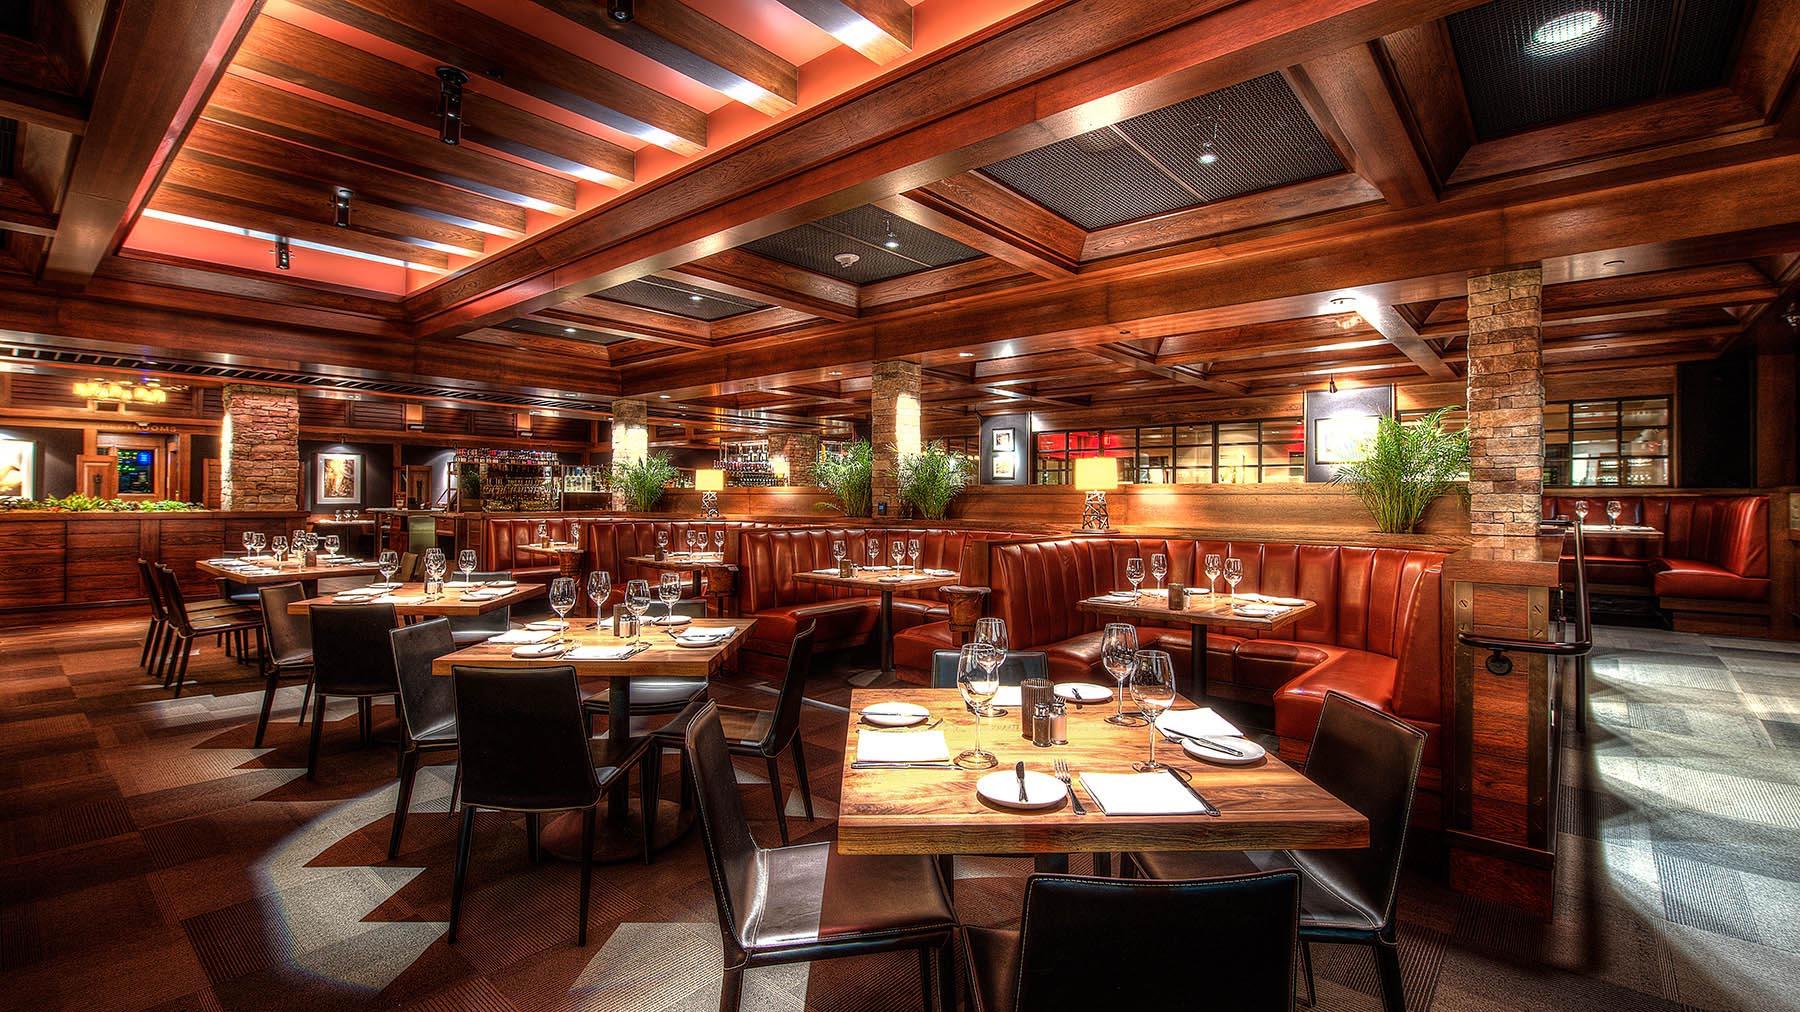 The Ranch Restaurant Glumac MEP Engineering